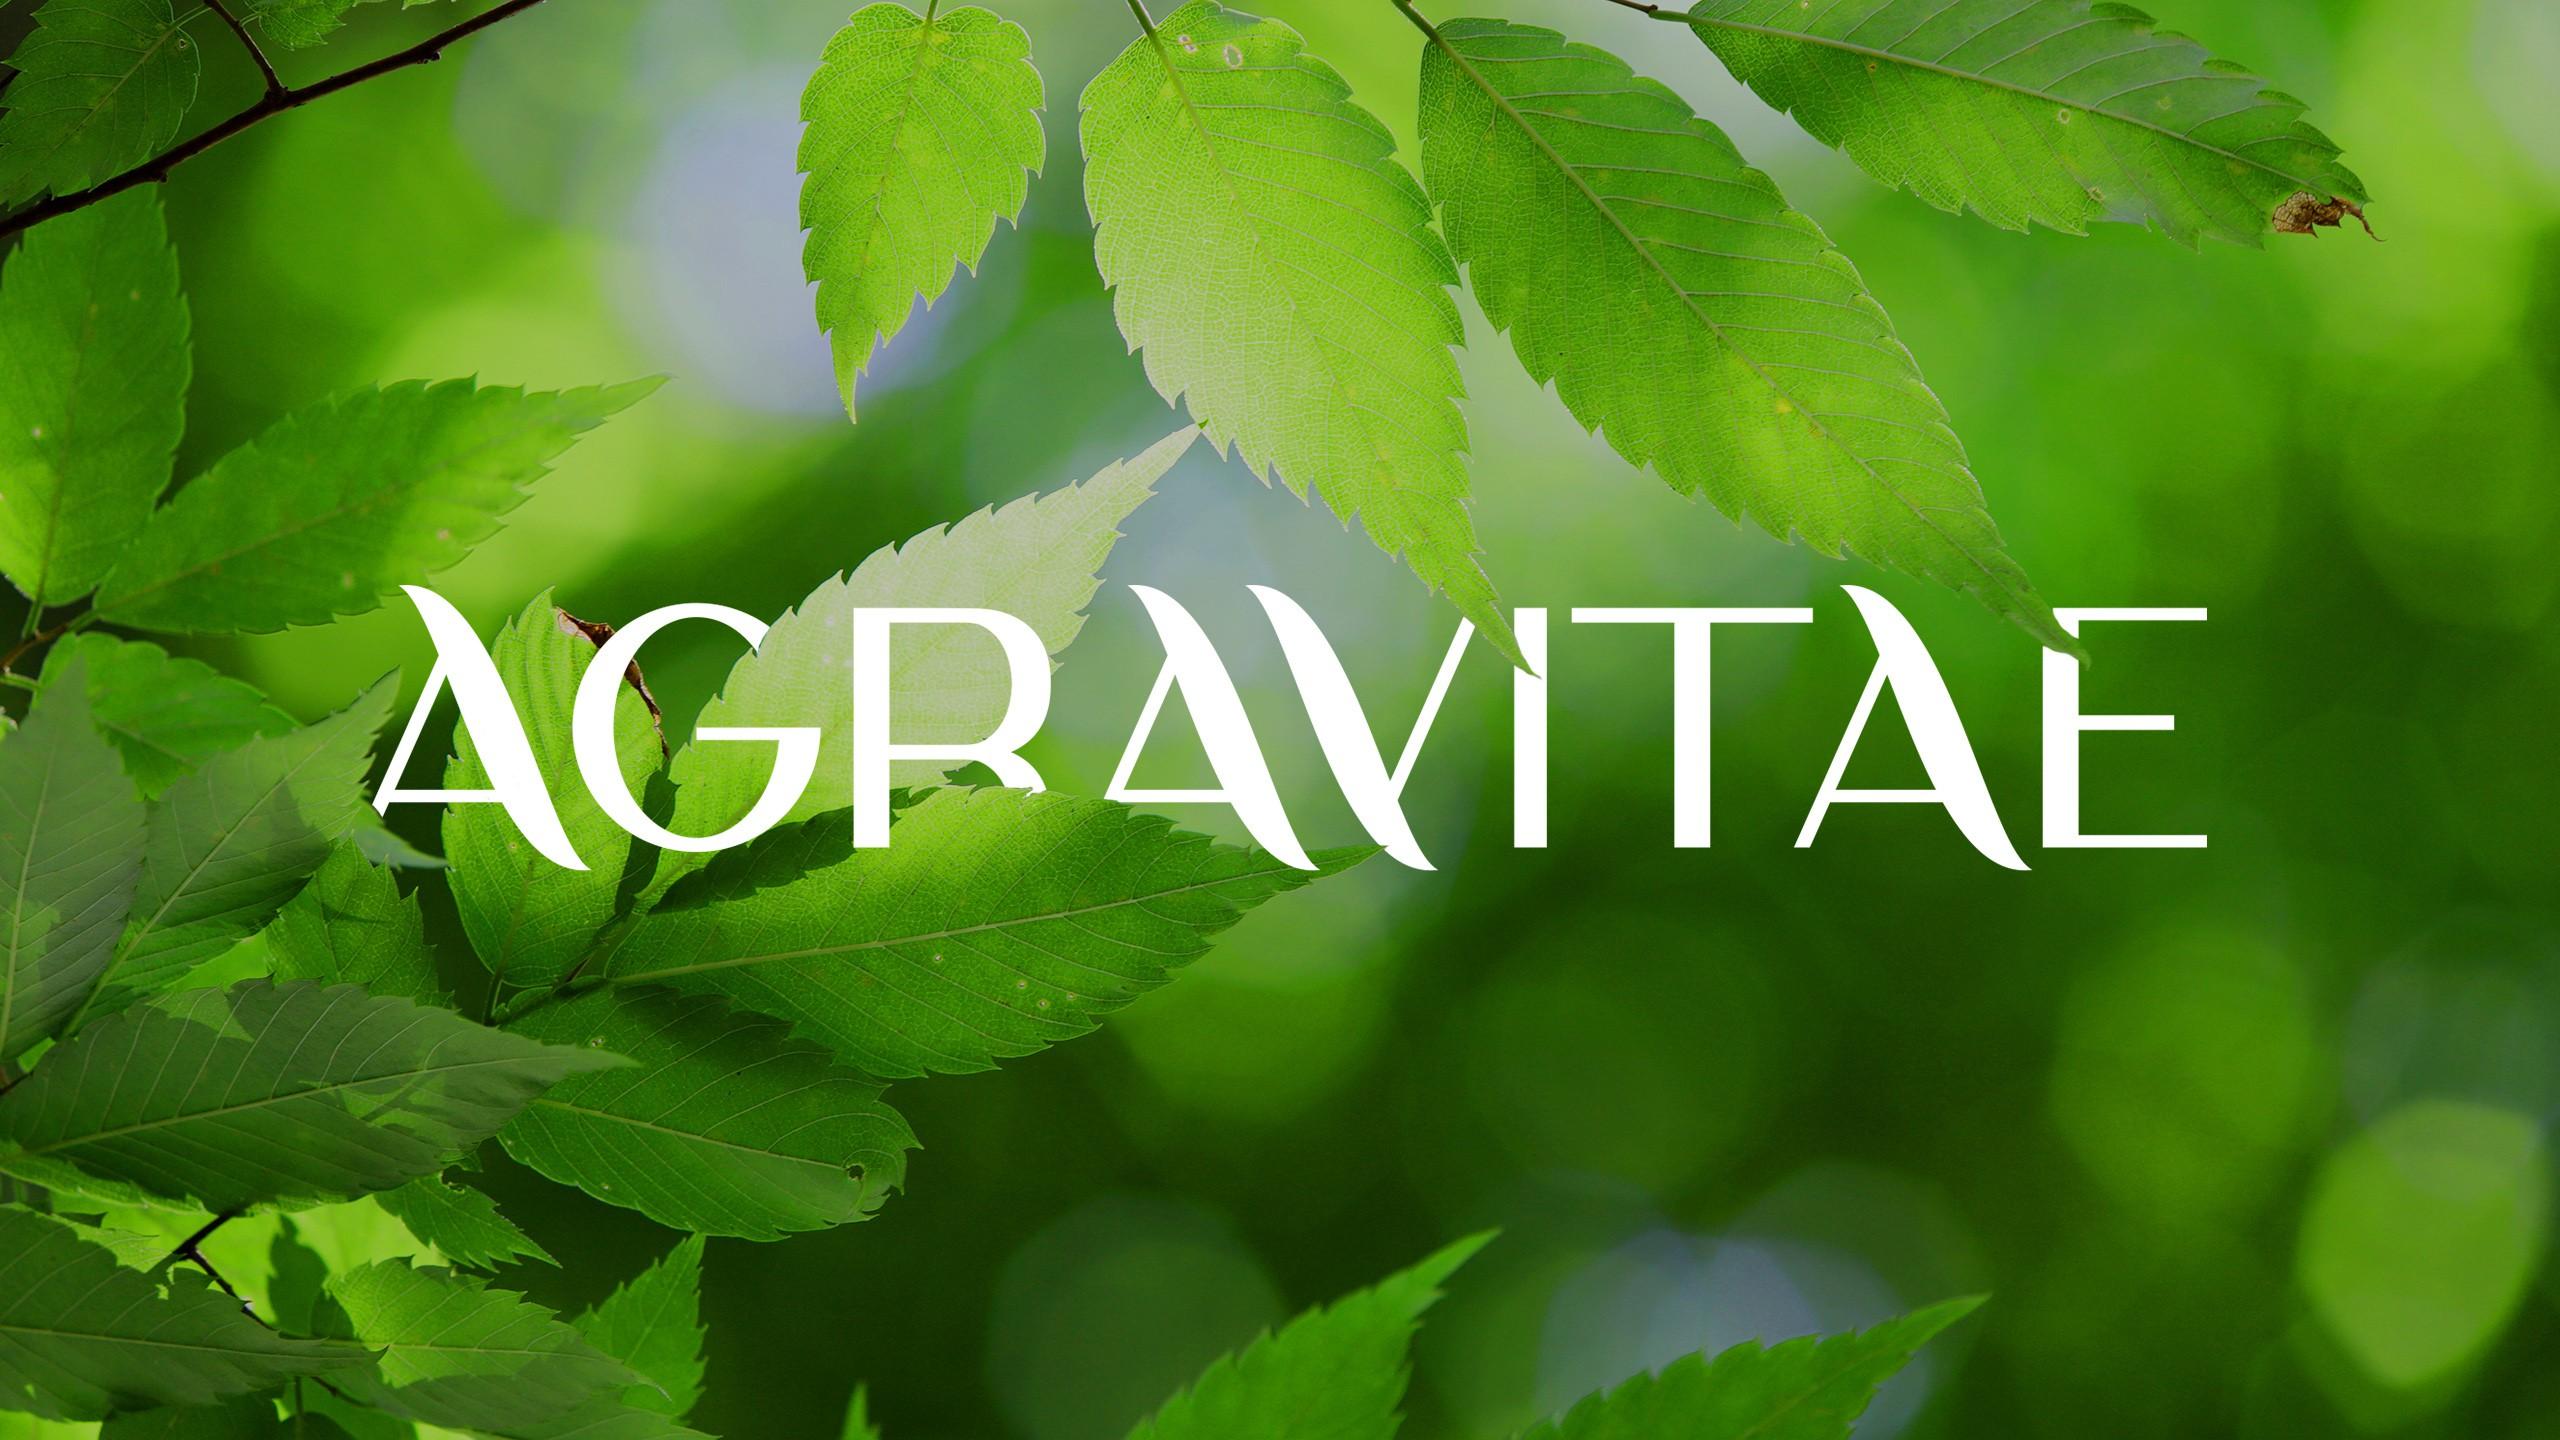 Agravitae Social Media Pages design